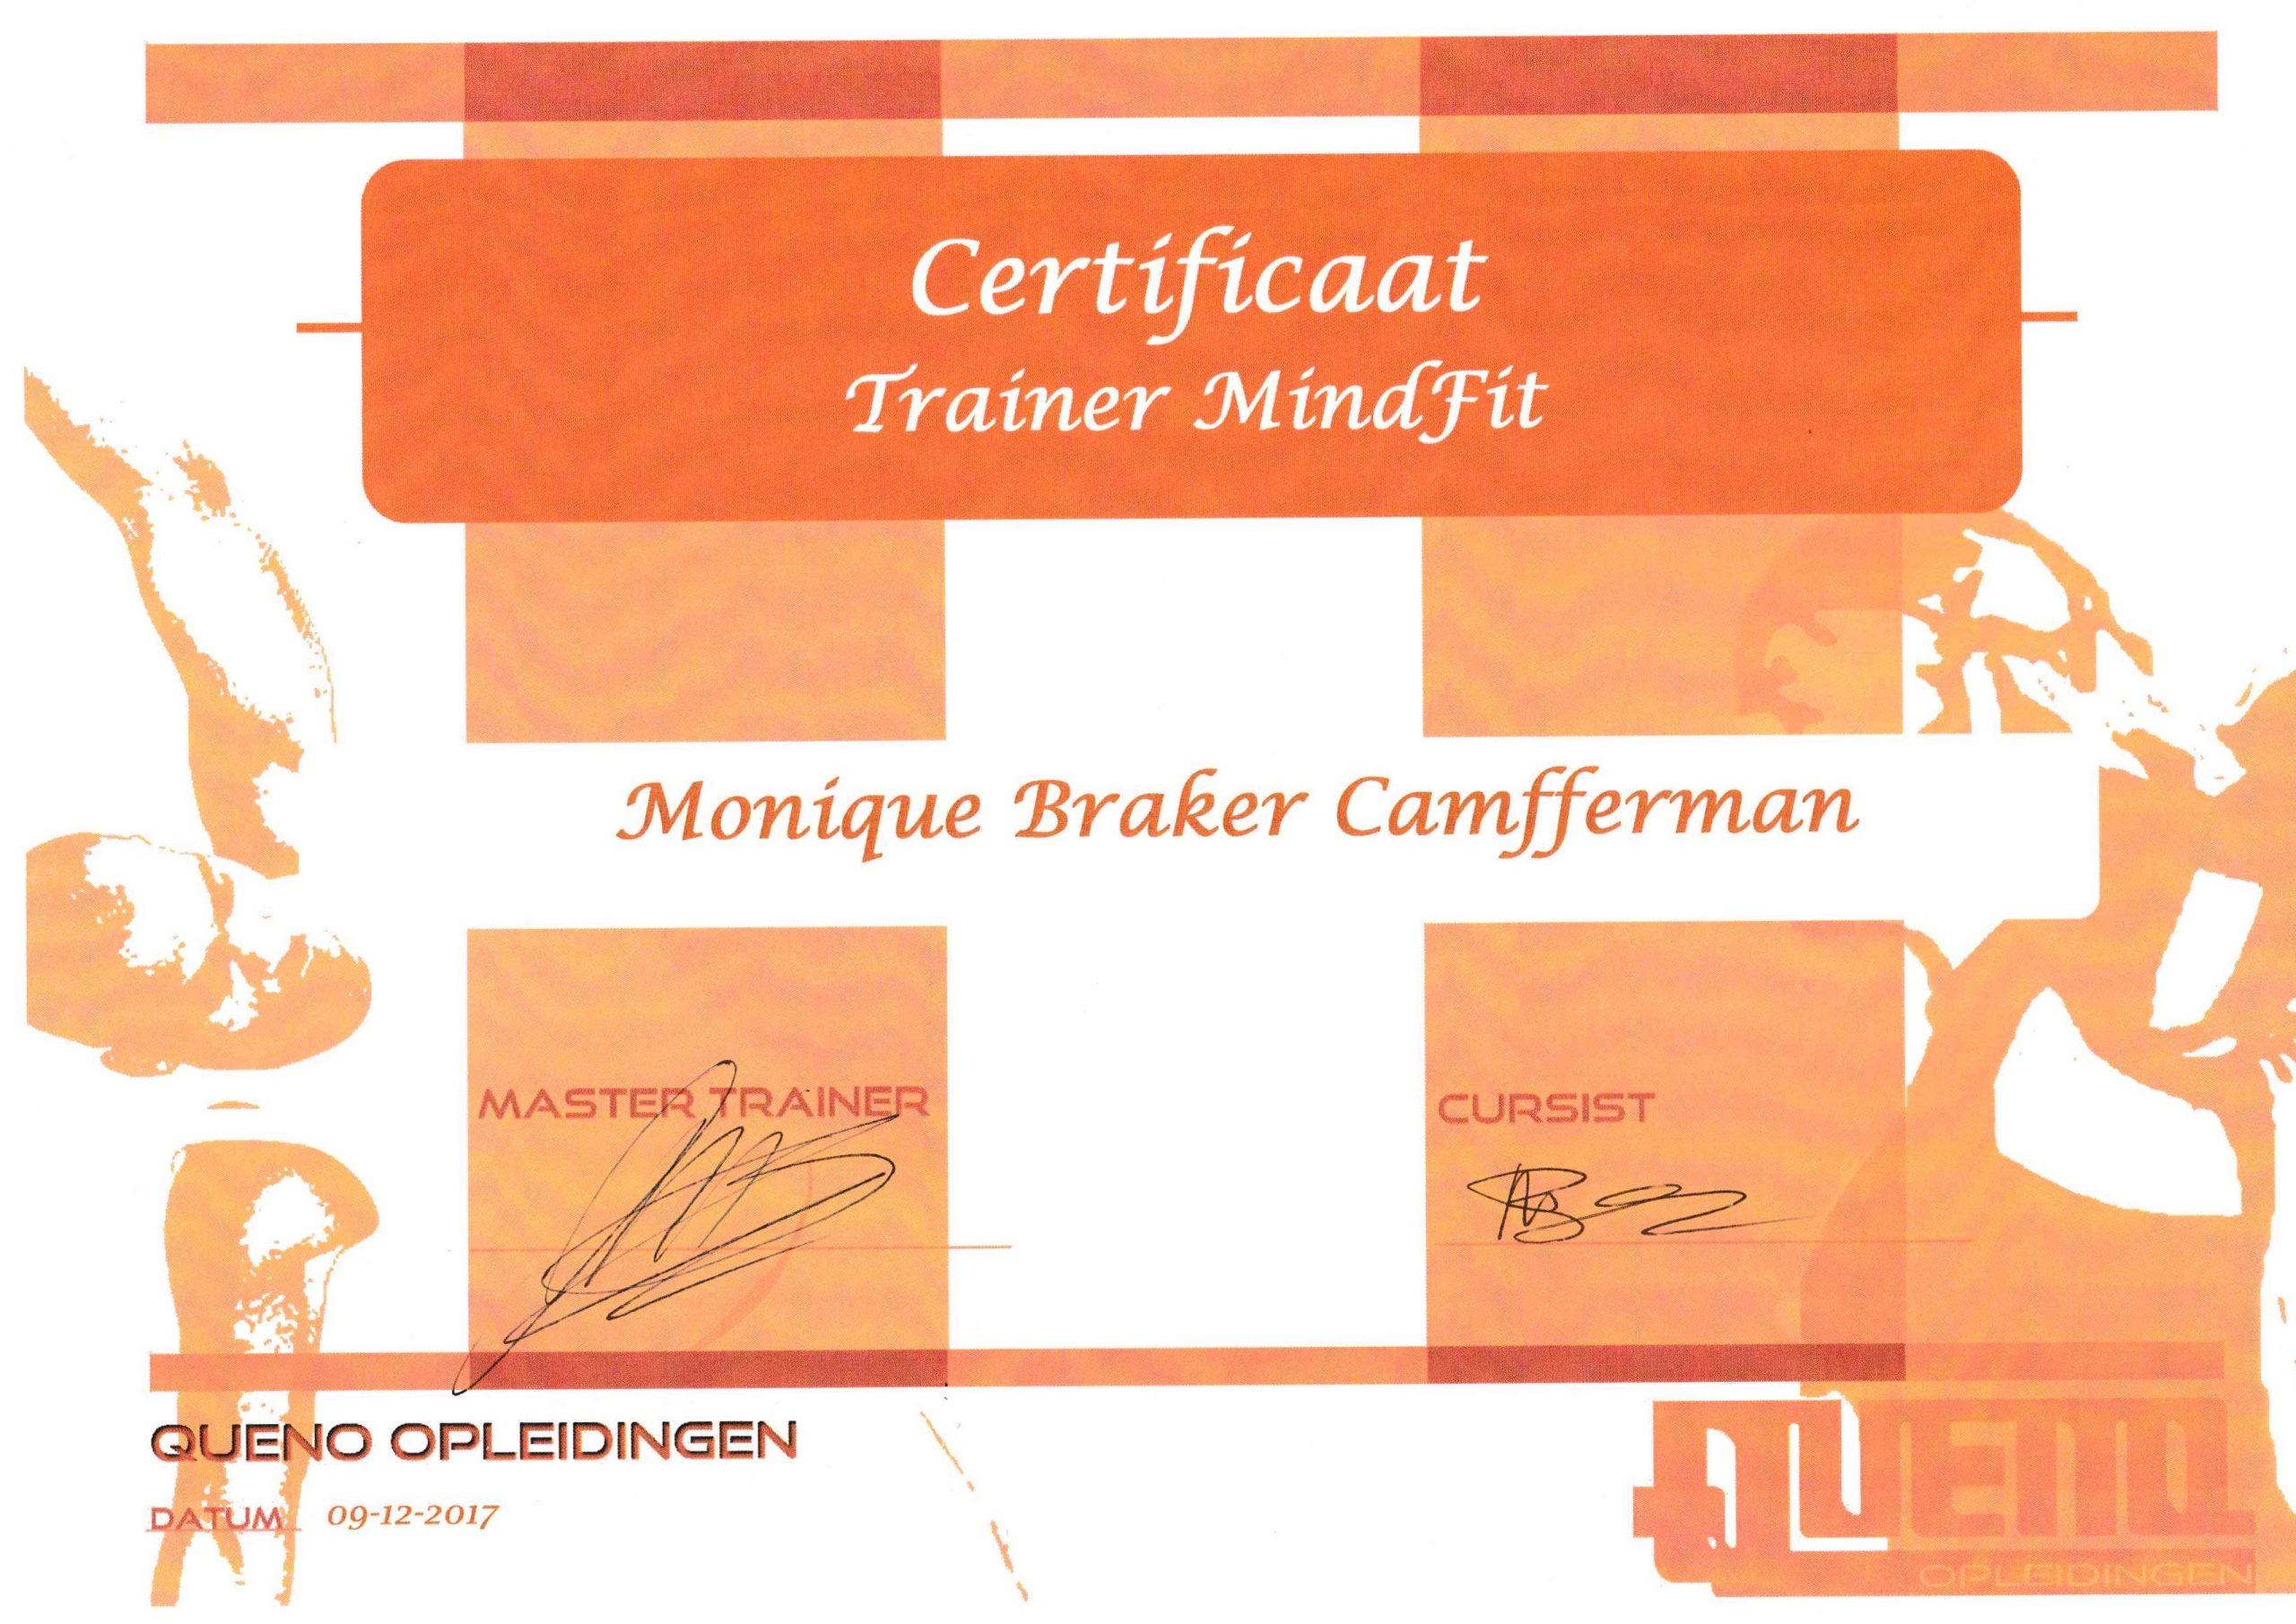 Certificaat Trainer MindFit